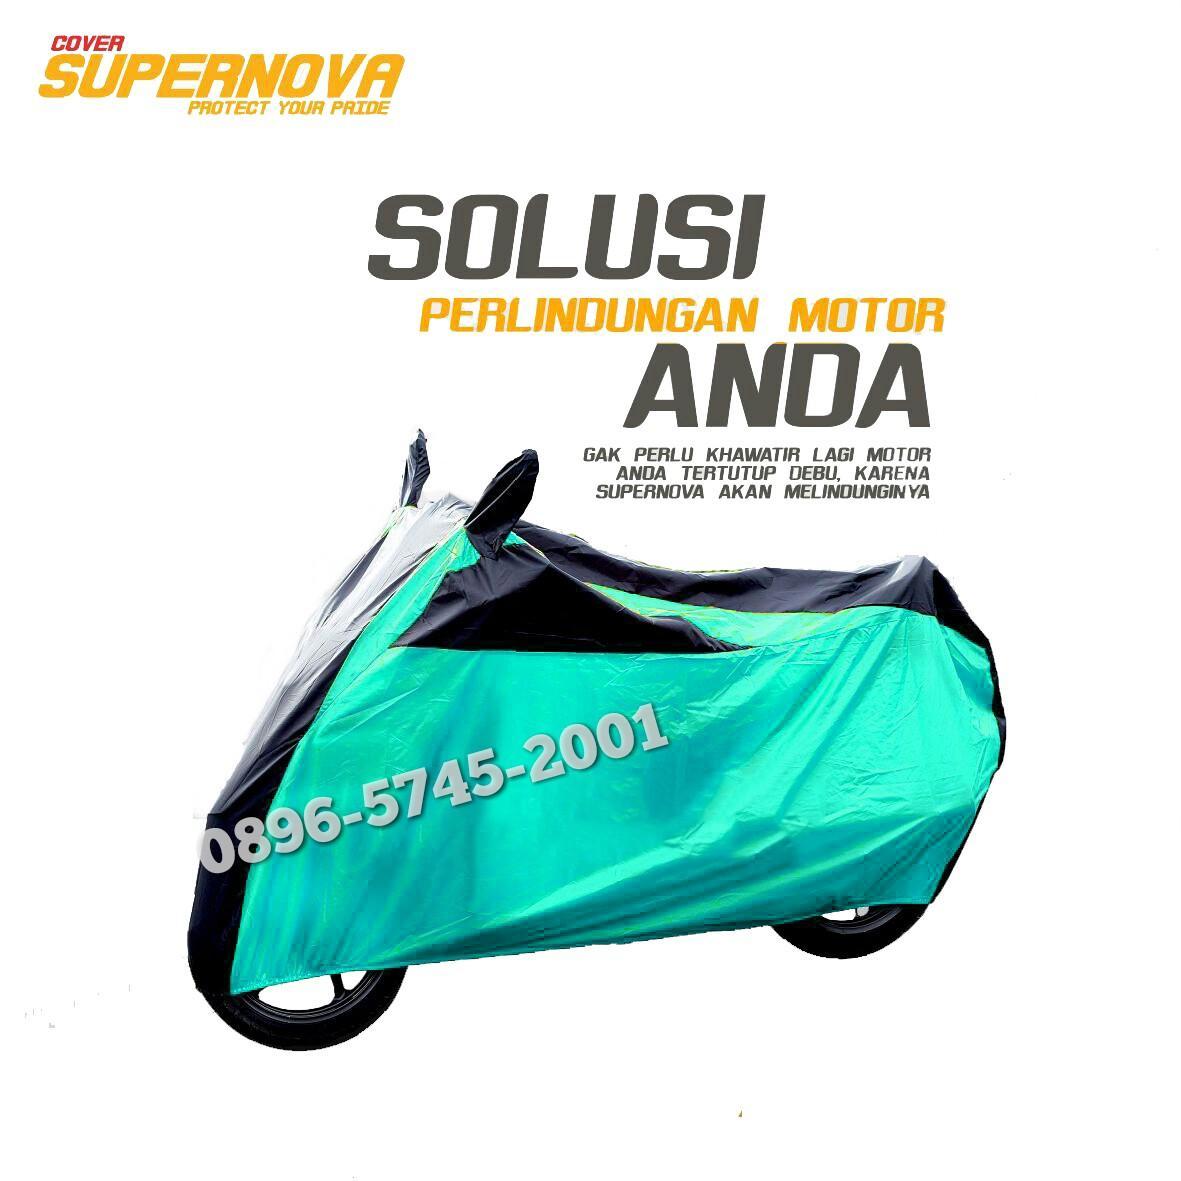 Supernova Cover Motor Bebek - Matik - Toska